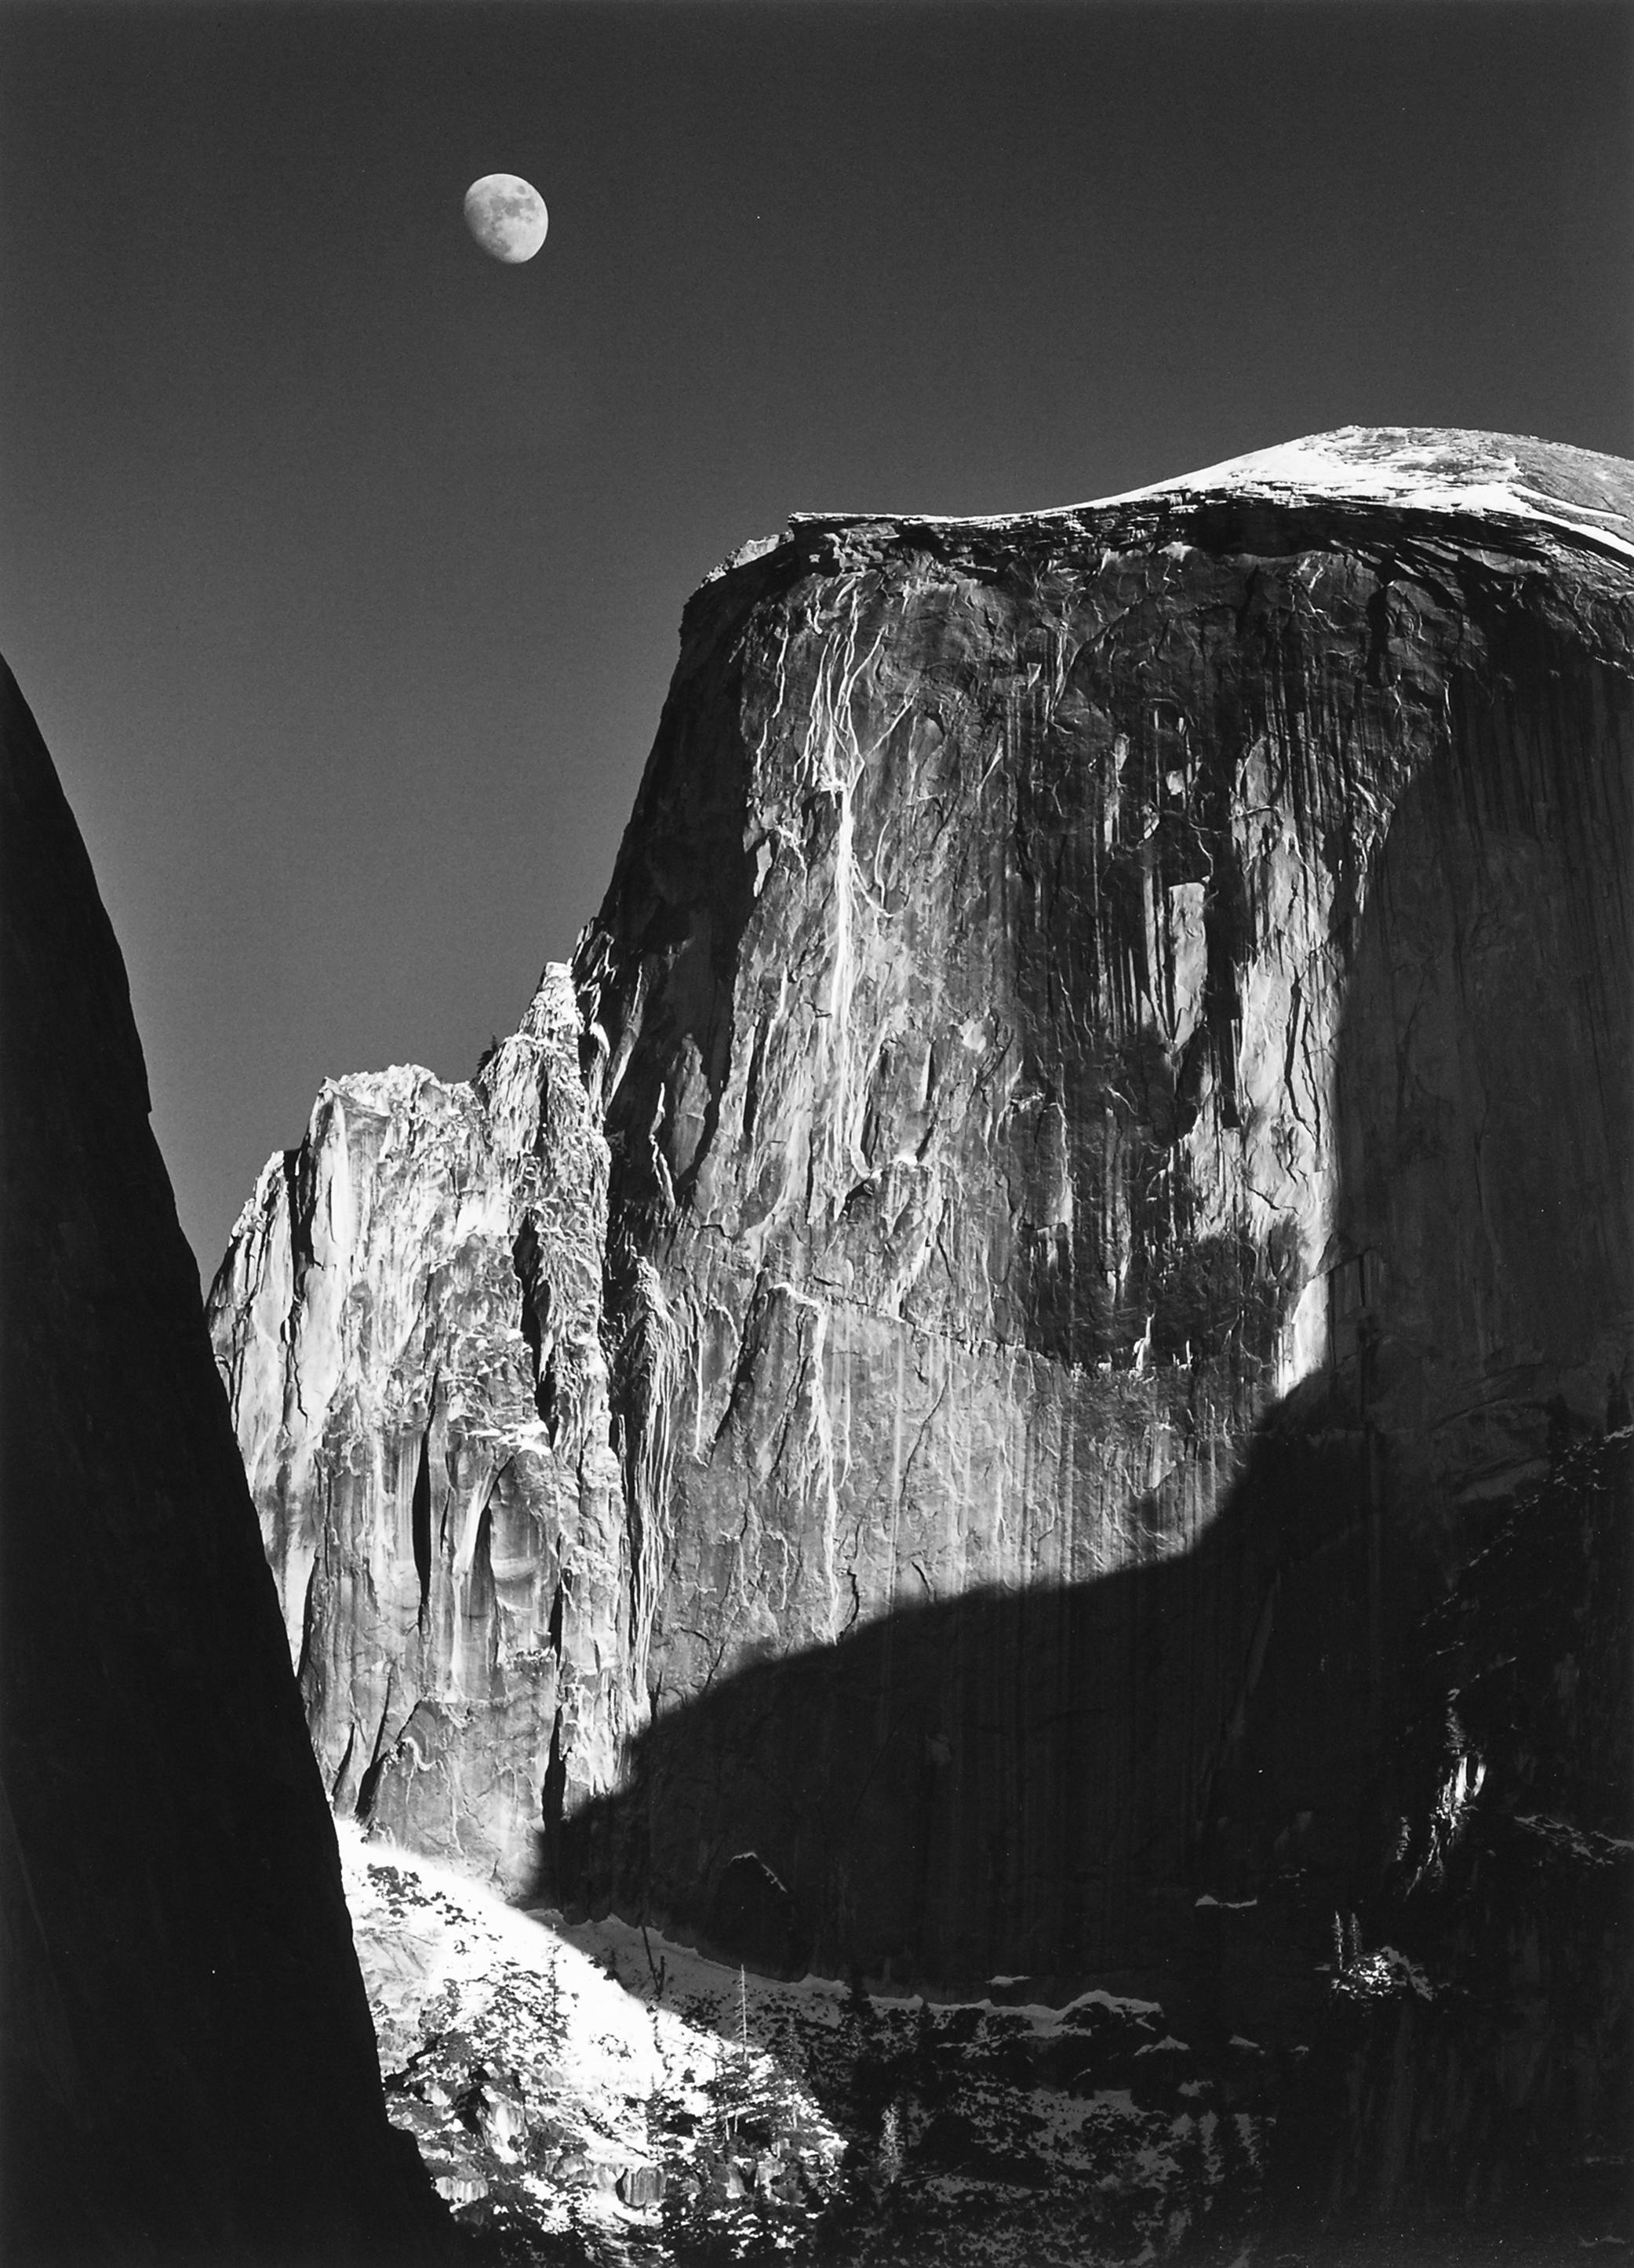 Yosemite Valley, Ansel Adams